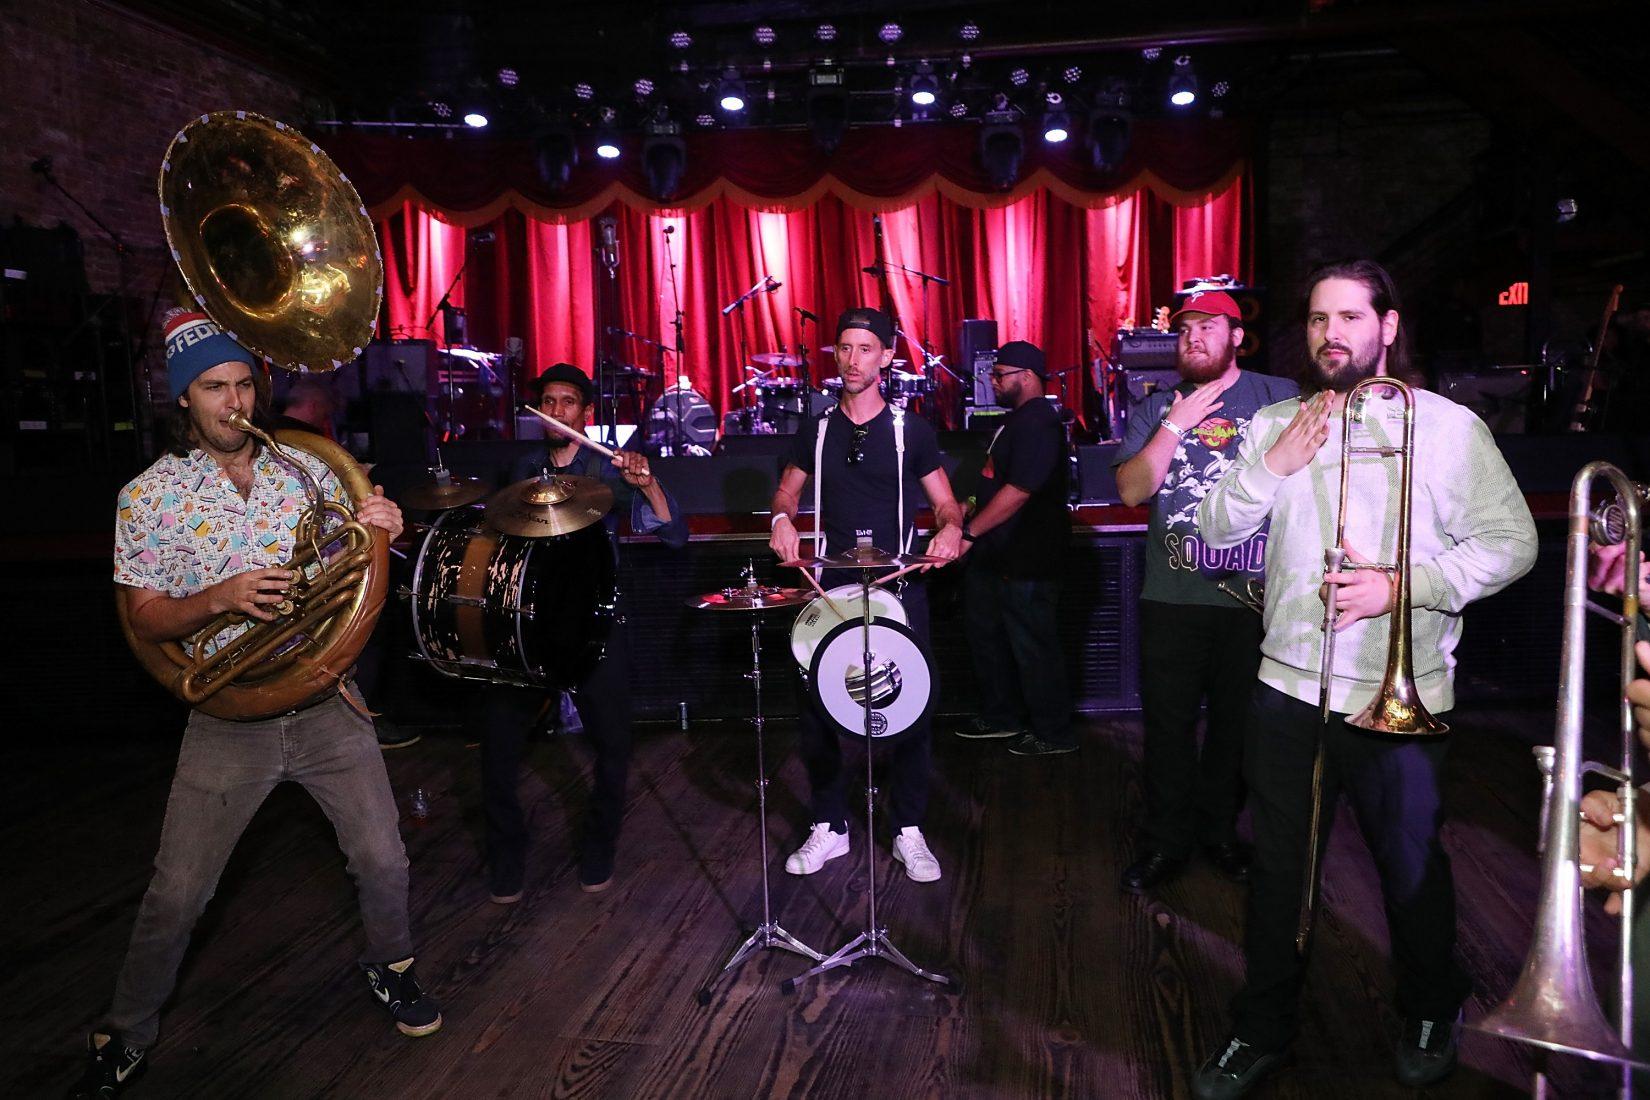 New York Public Radio Rocks Out At Brooklyn Bowl Fundraiser